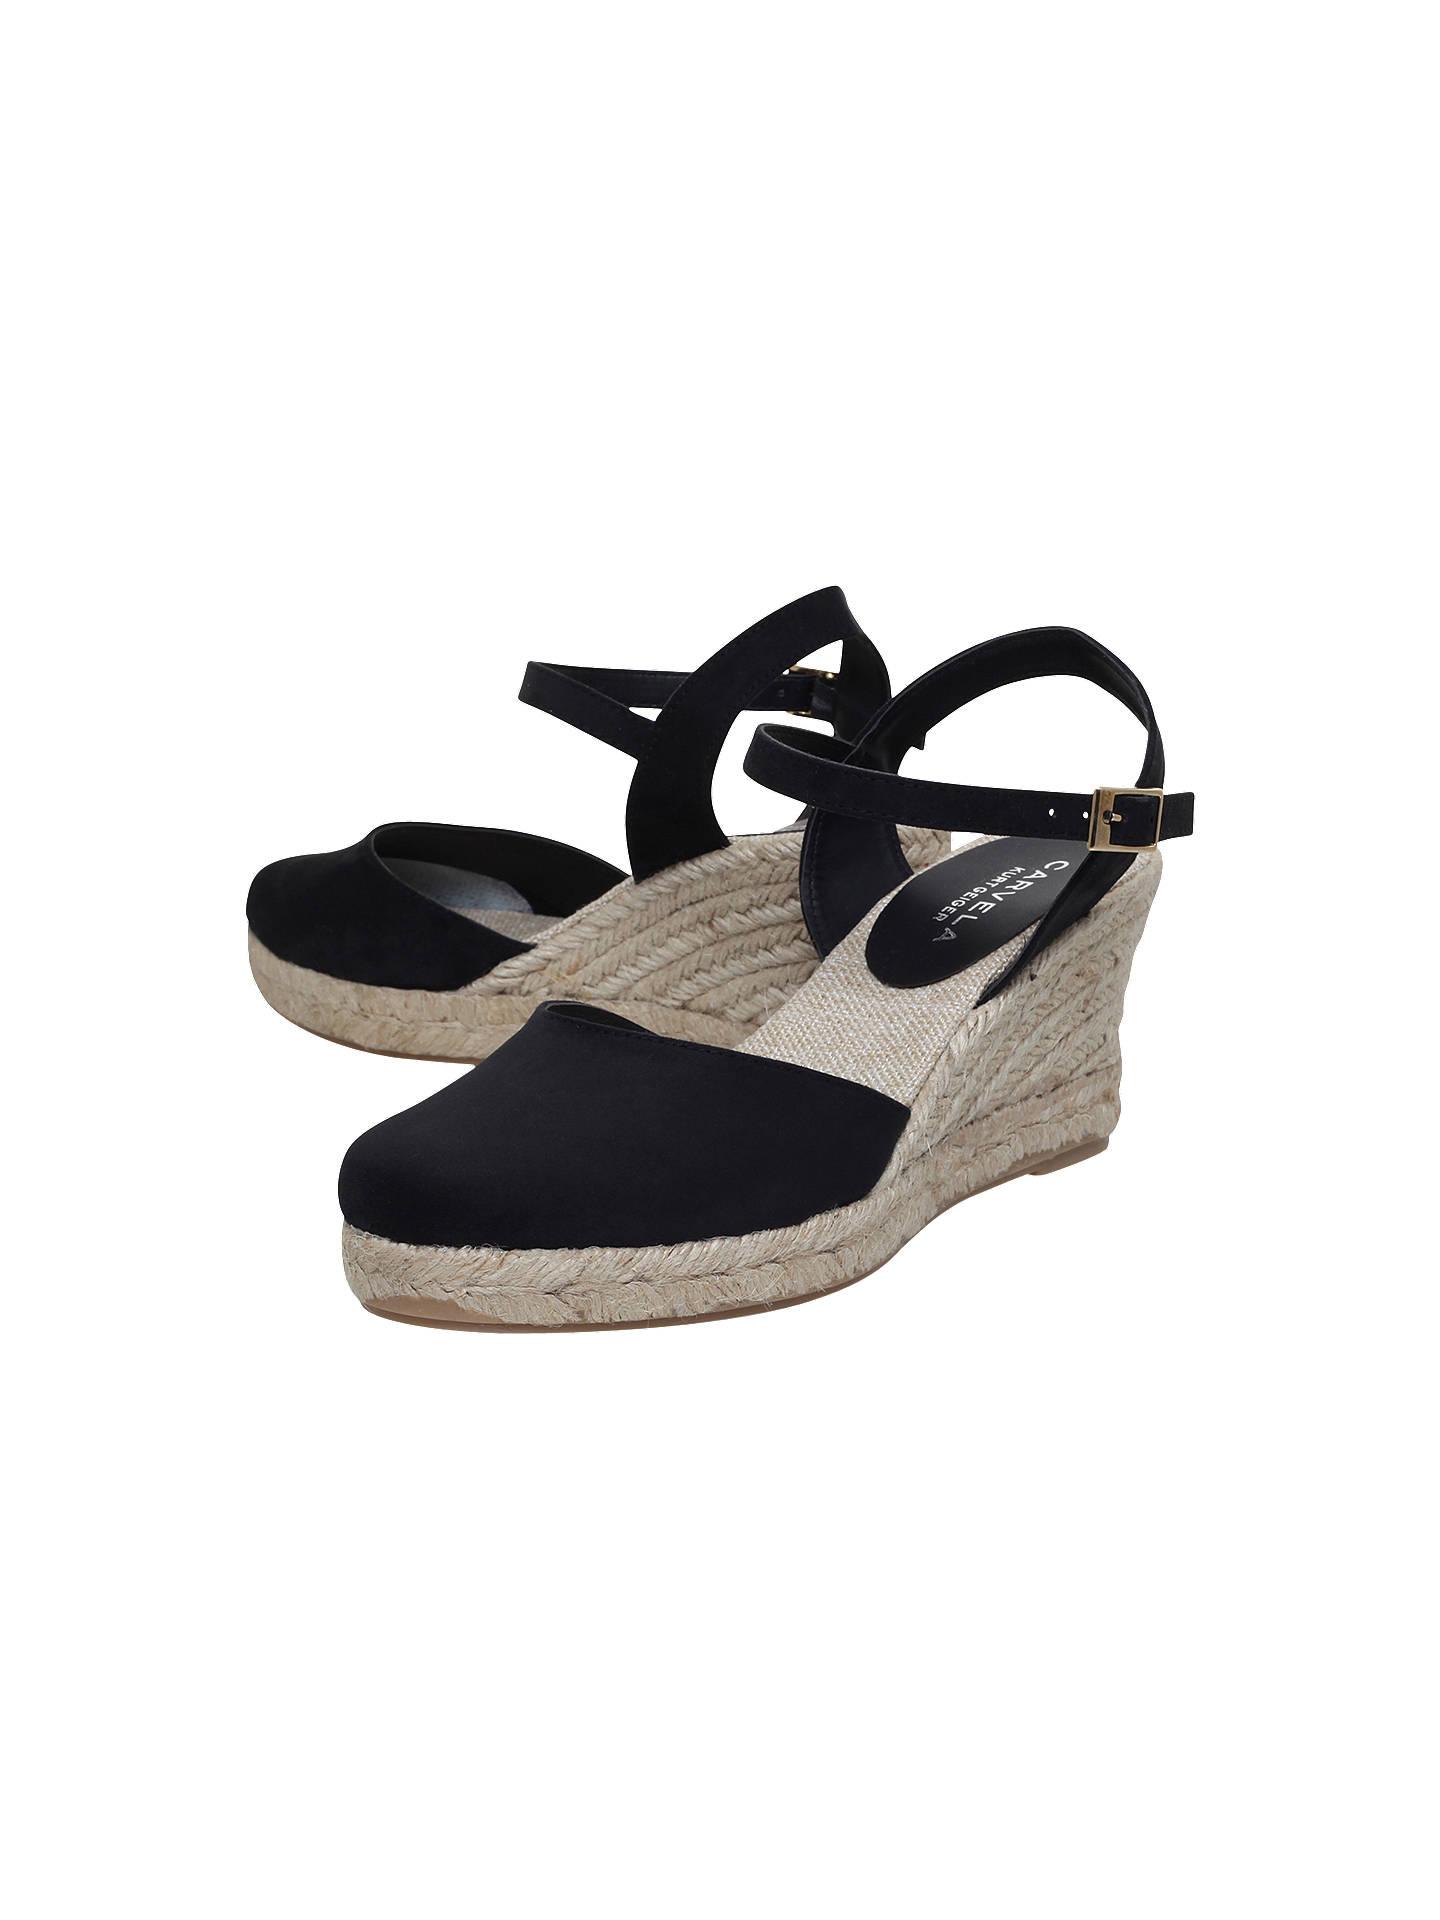 a500421dd5a Carvela Sabrina 2 Wedge Sandals, Black at John Lewis & Partners